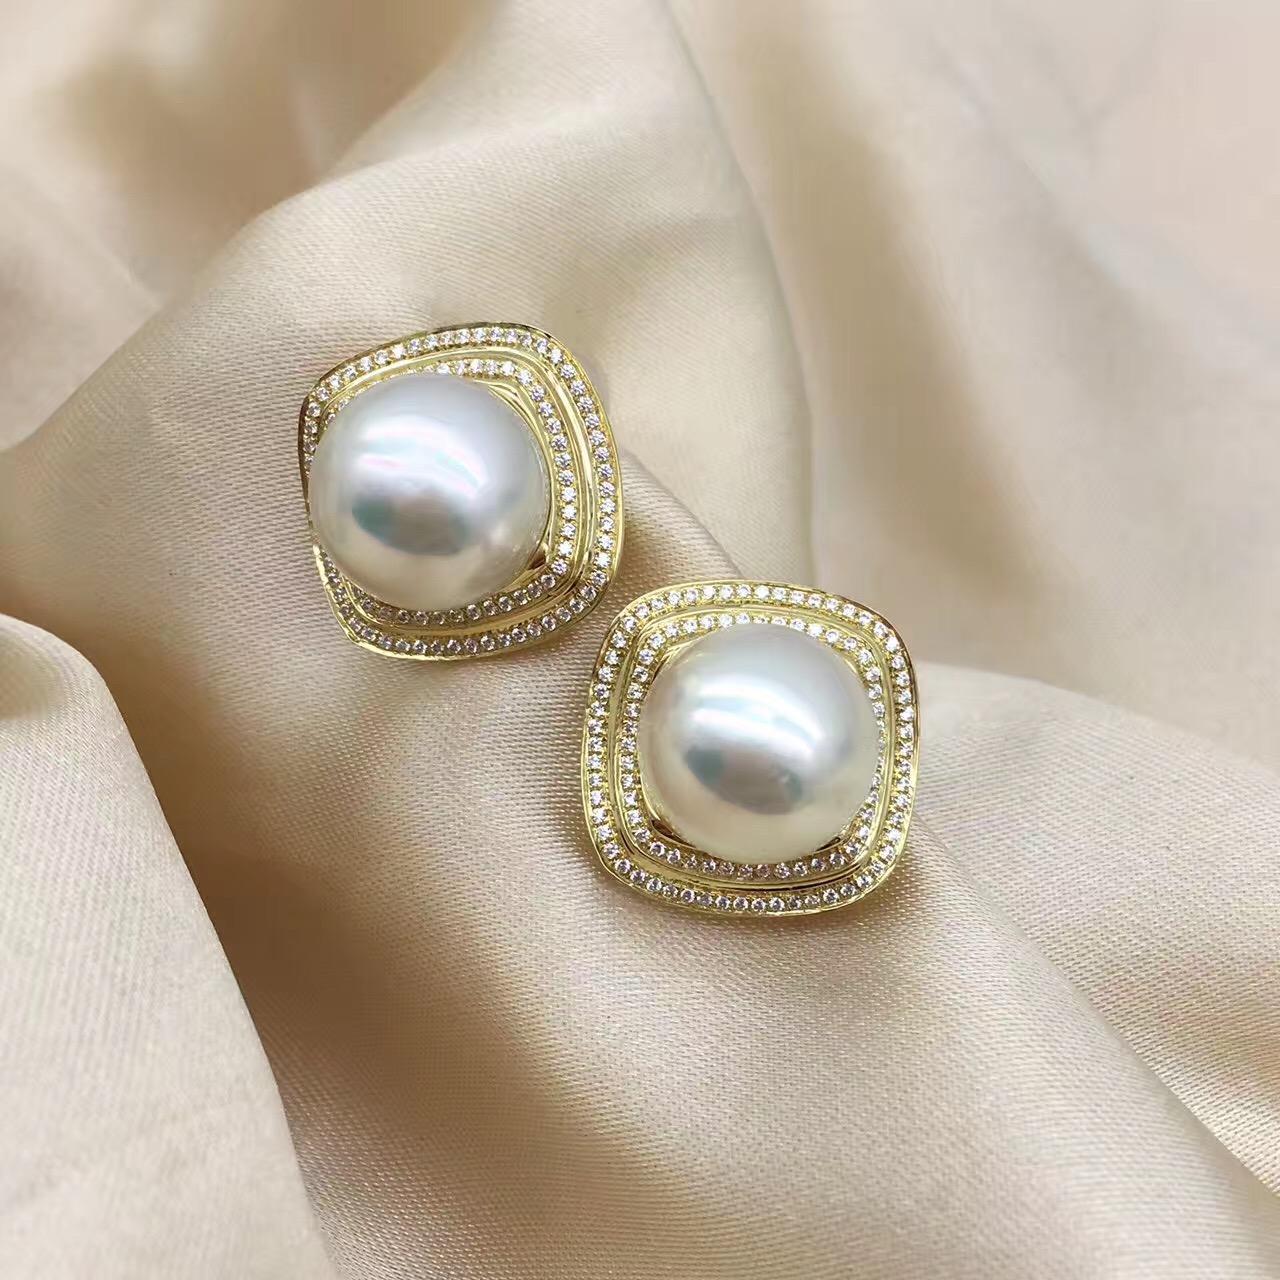 18K金镶嵌高亮度锆石南洋白珠珍珠11.2mm耳饰 表皮细腻光滑几乎无瑕疵